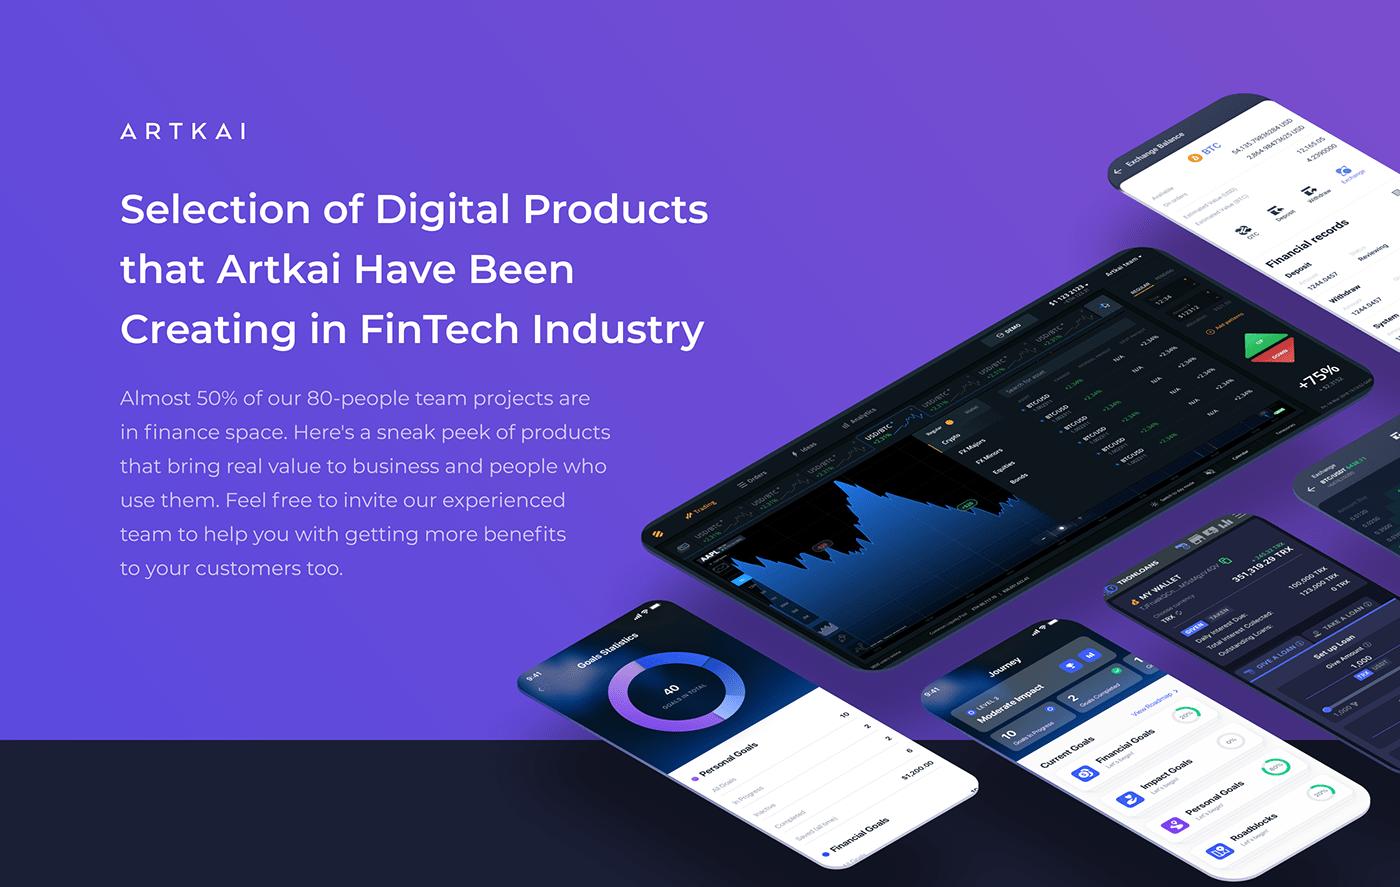 artkai blockchain financial Fintech trading UI ux Webdesign b2b BFSI